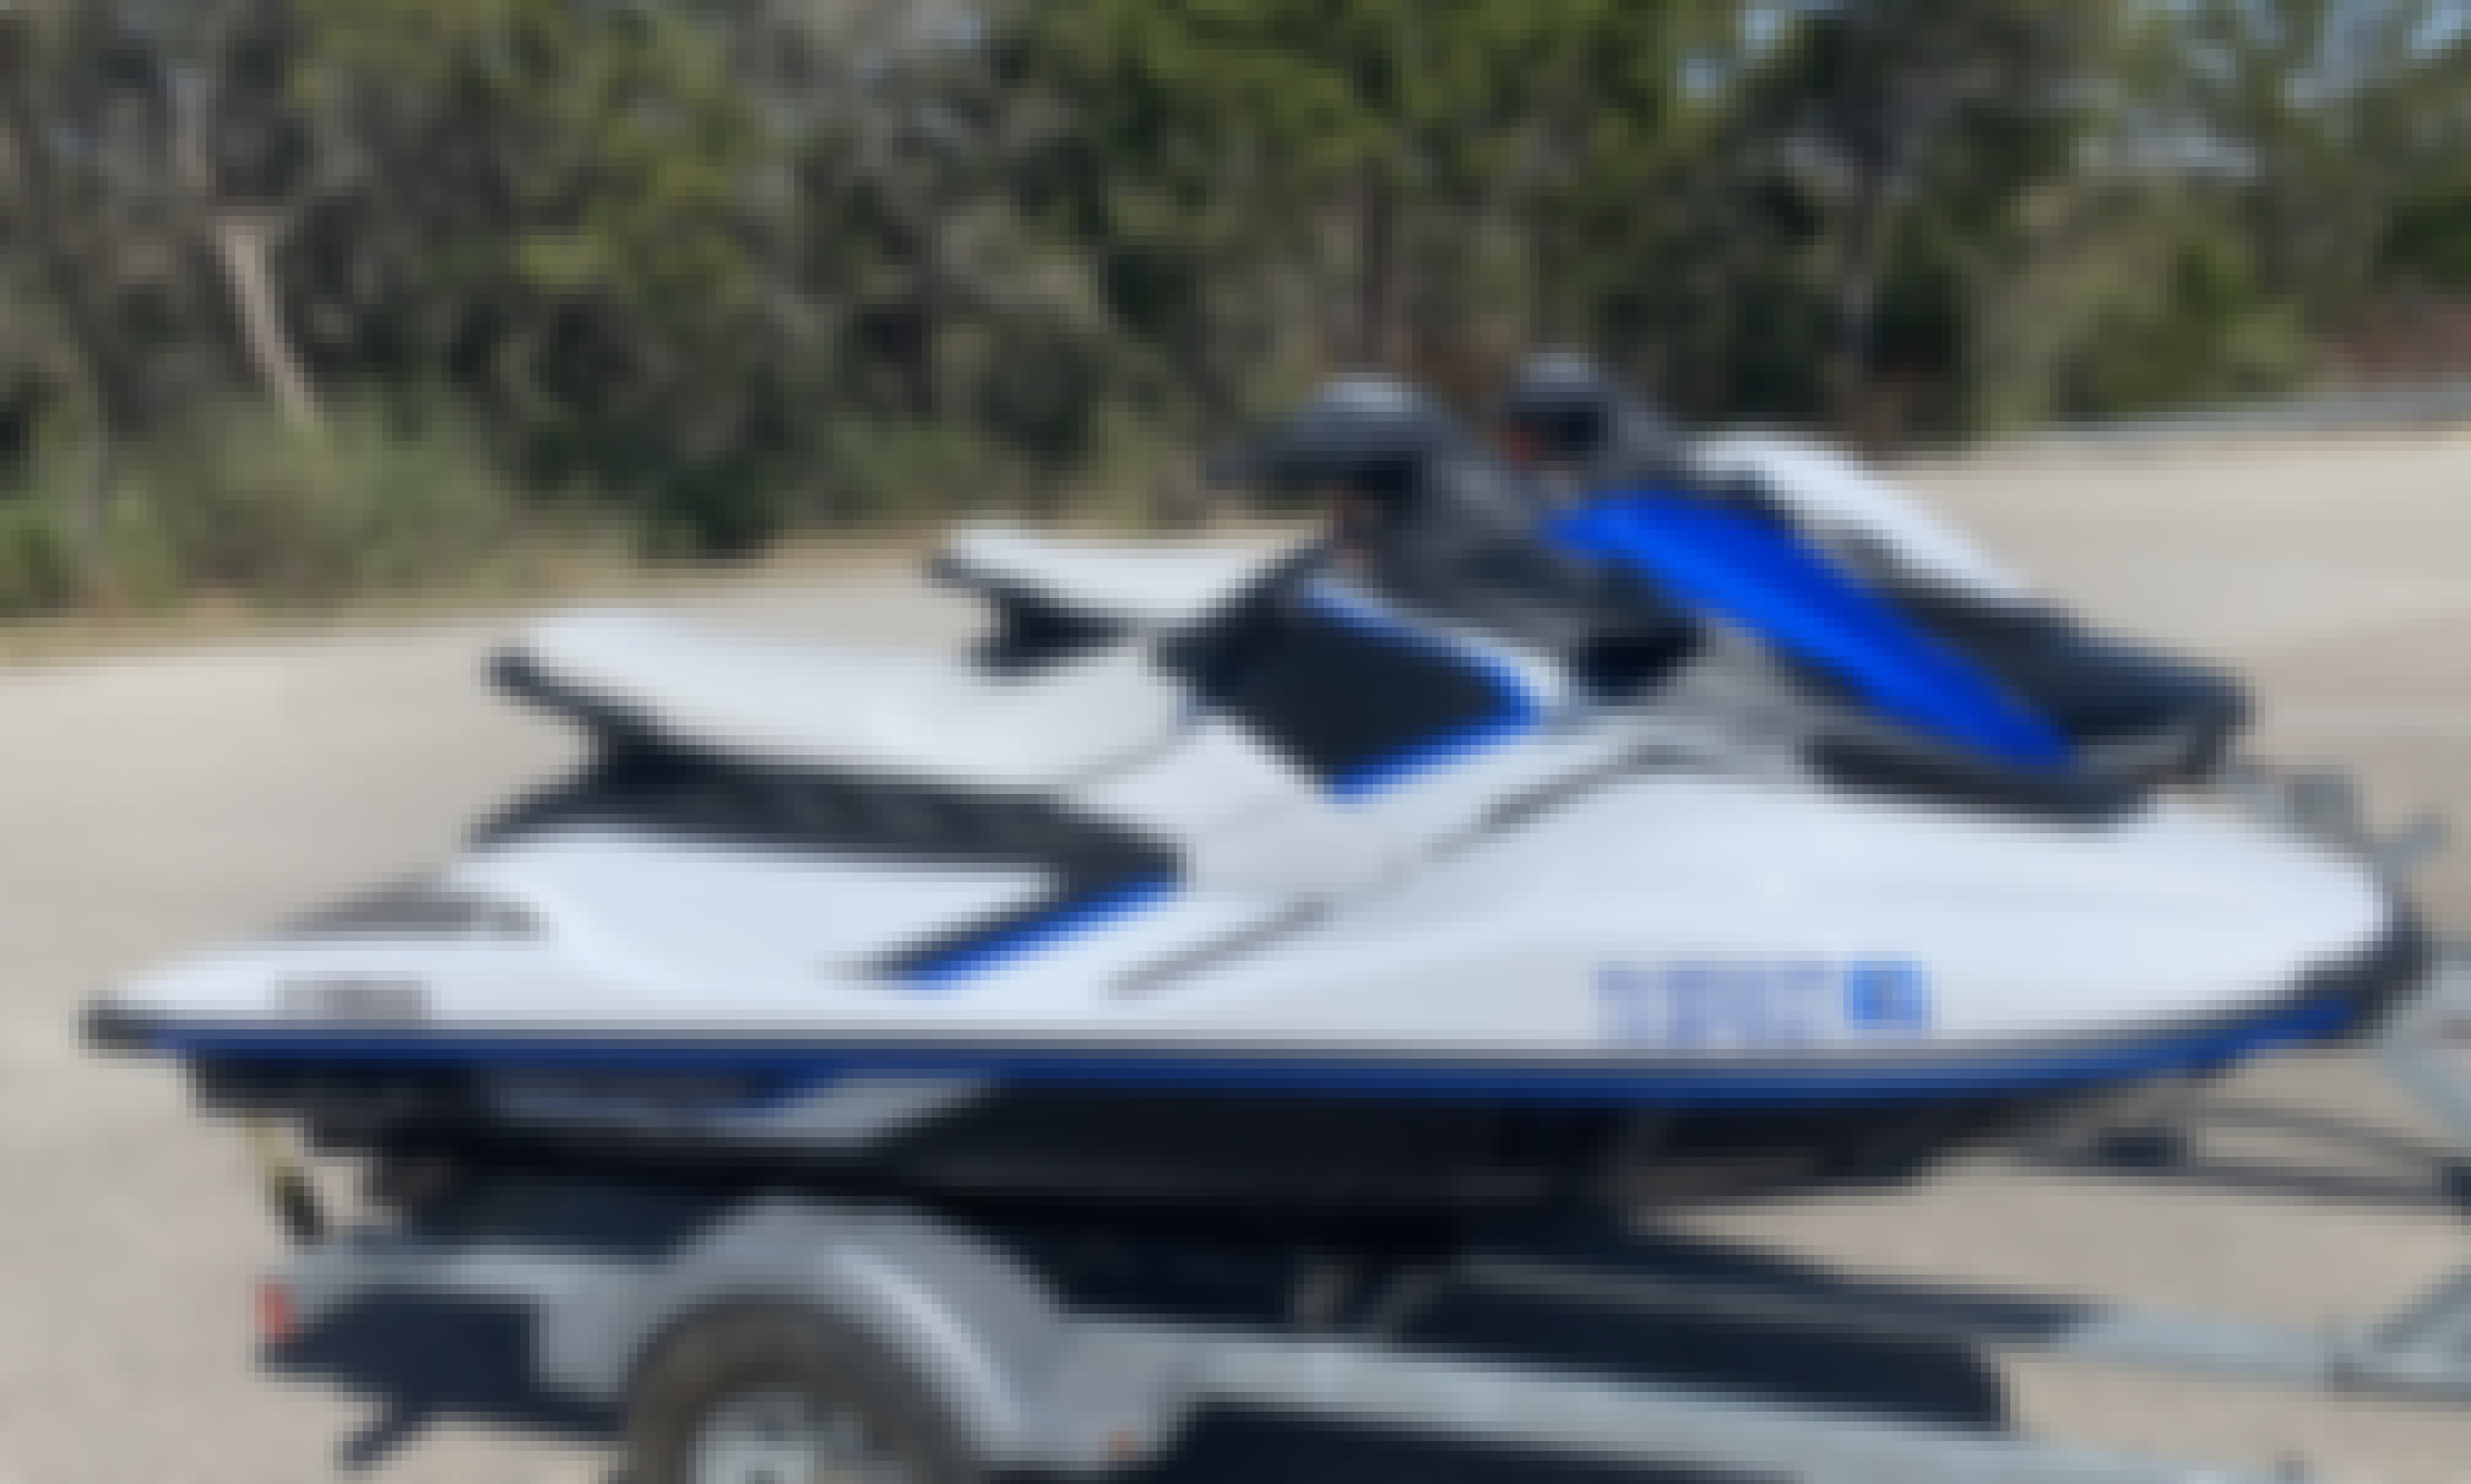 2018 Yamaha Waverunner for Rent in Austin